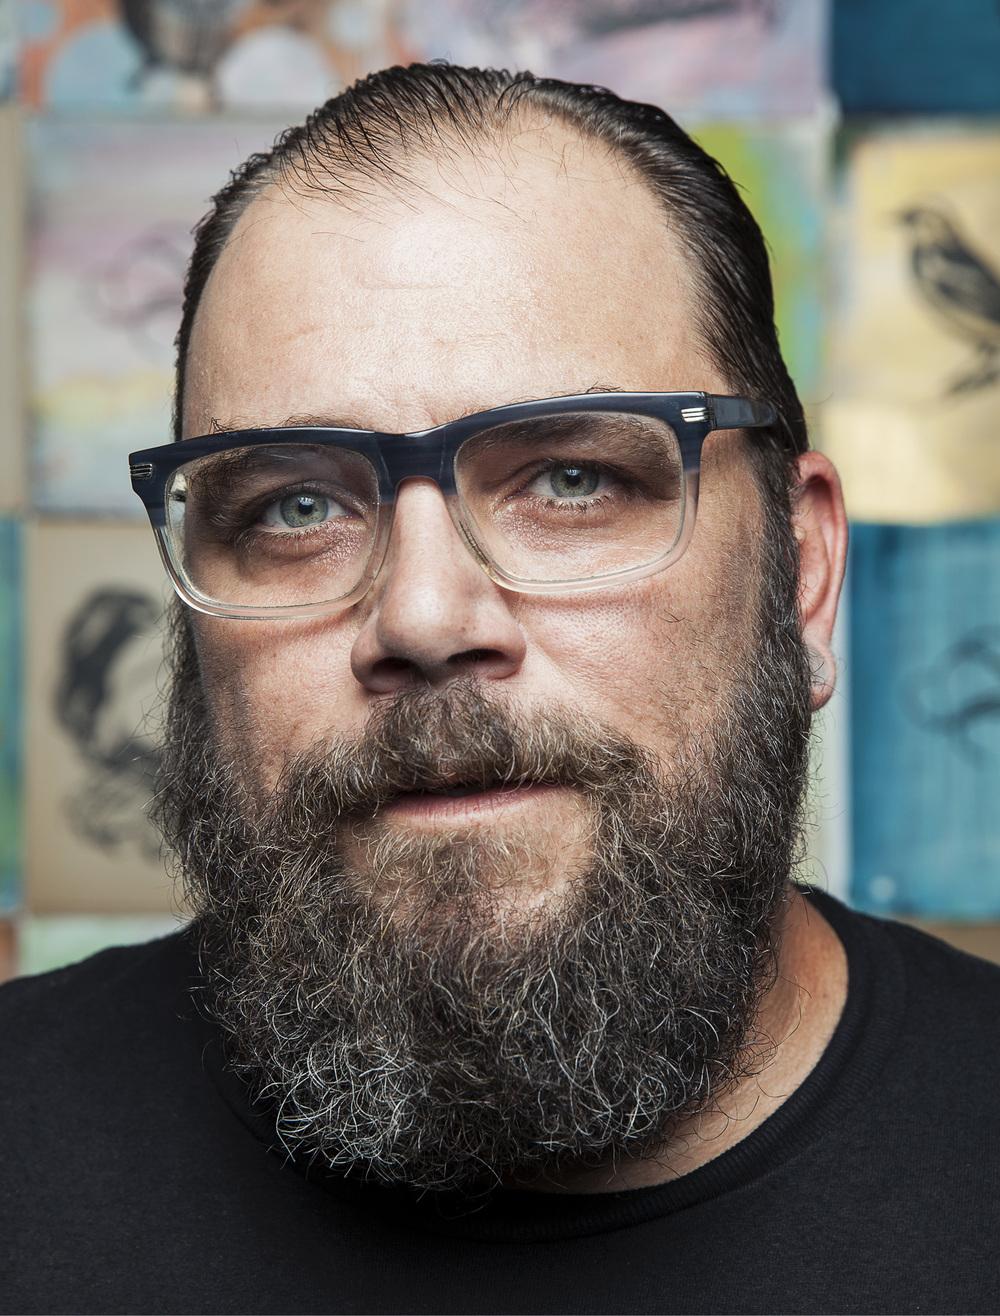 Damon of Nomad Art Compound